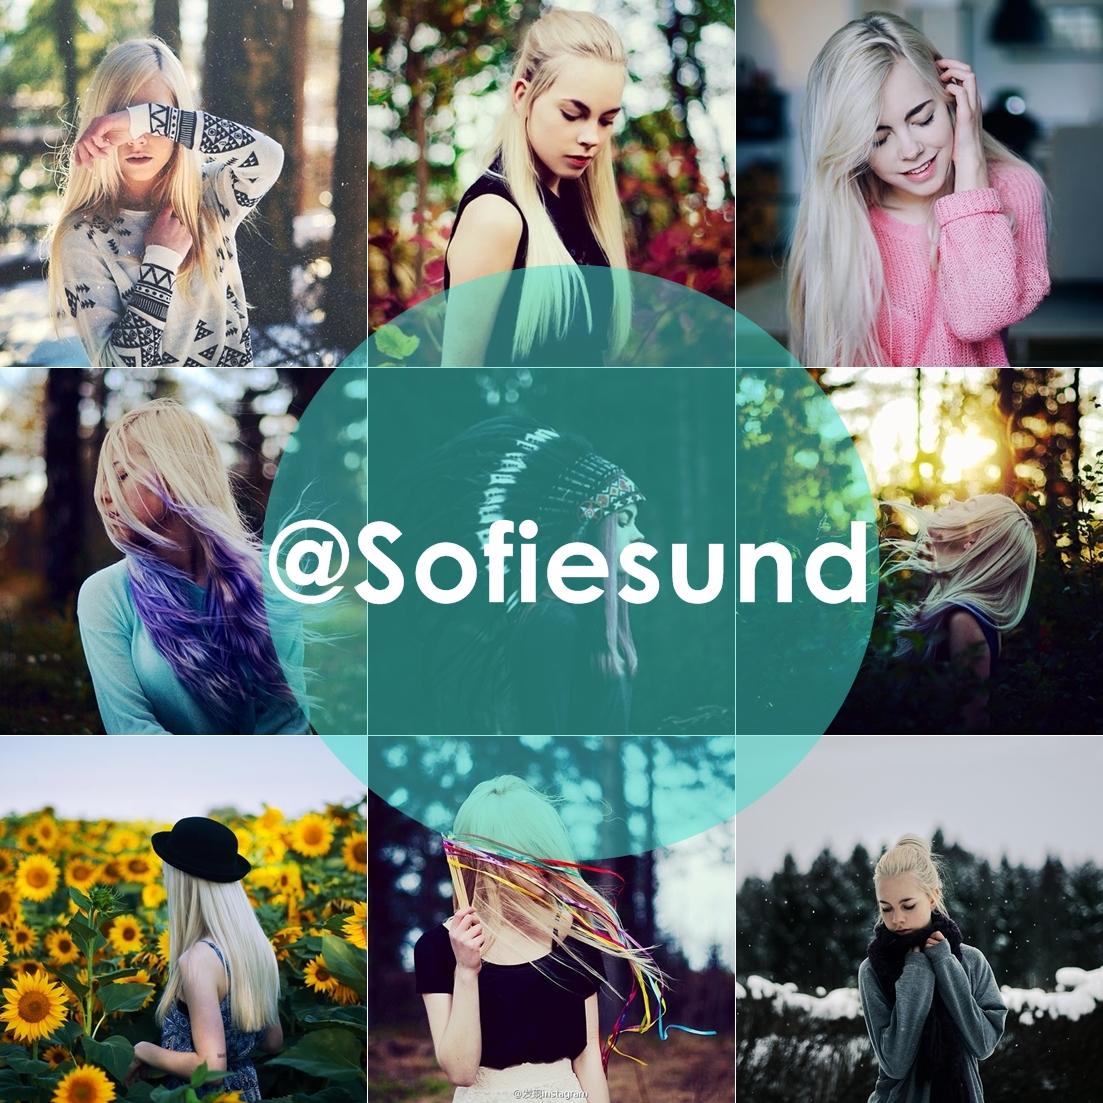 instagram-sofiesund